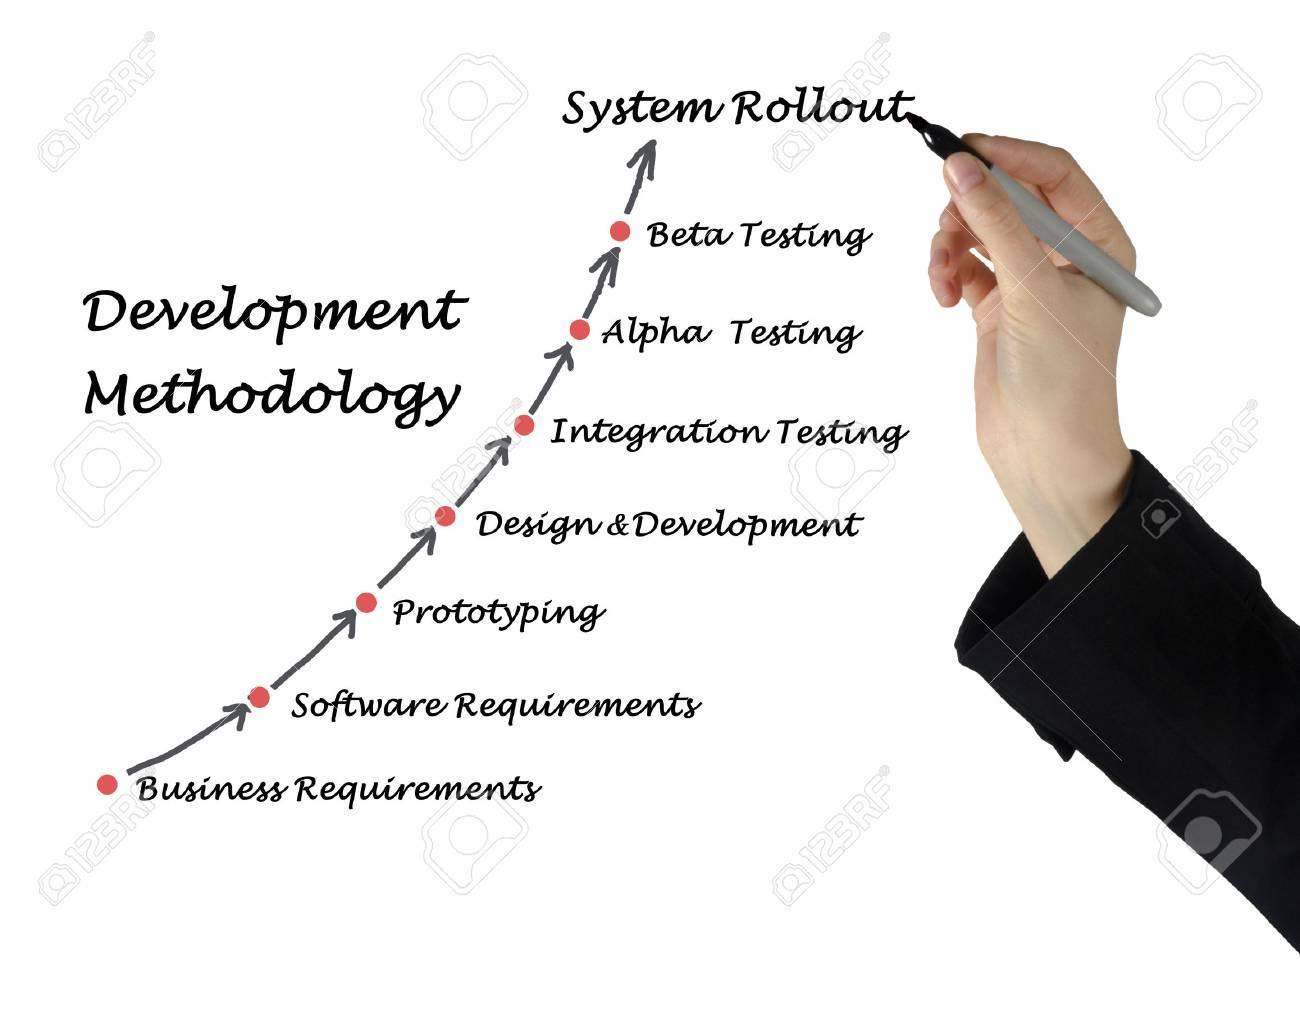 Development Methodology Stock Photo - 37030001